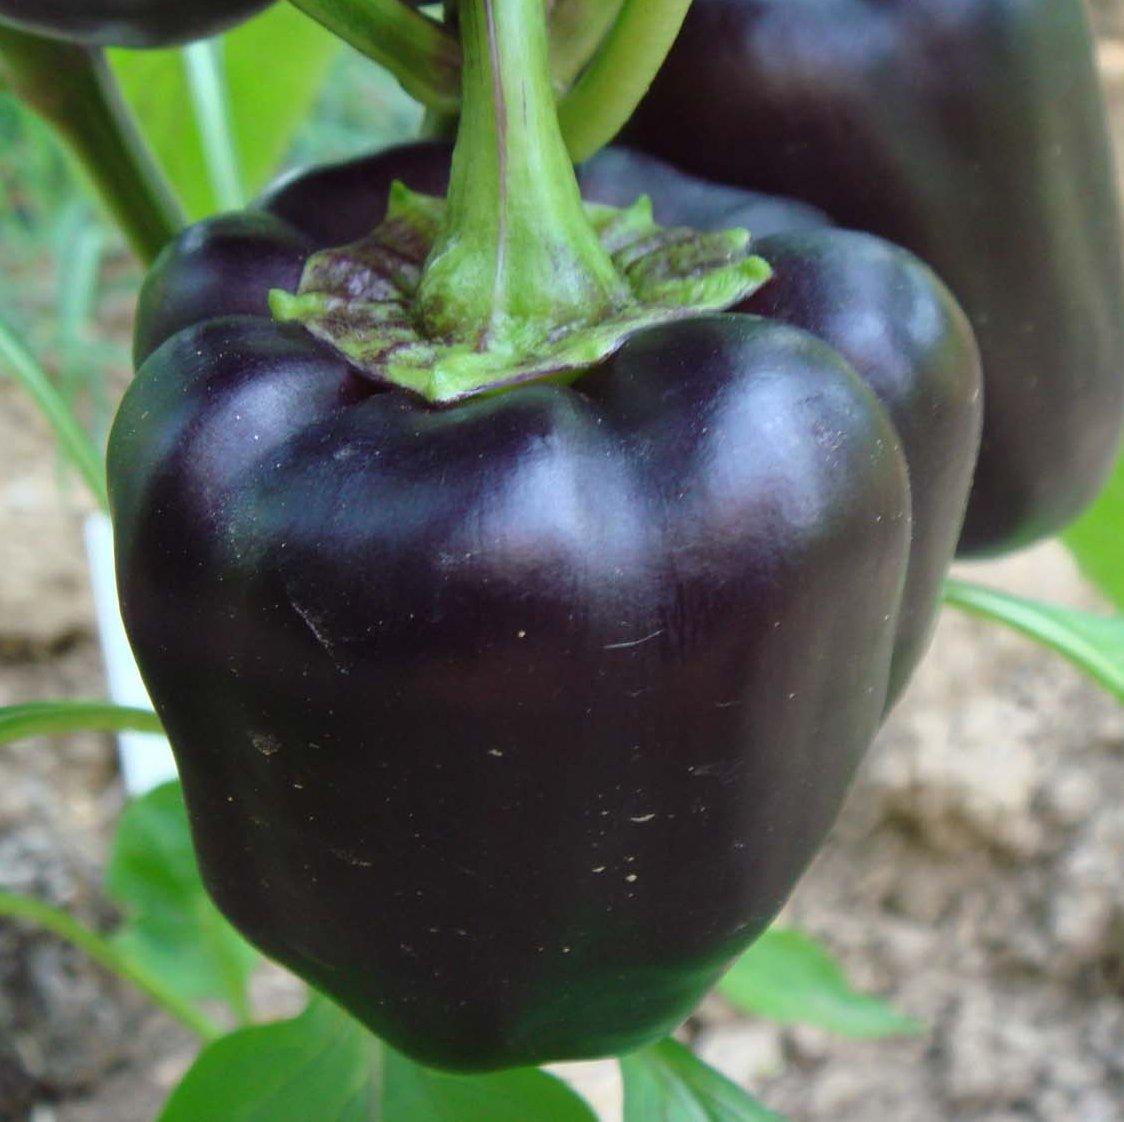 Organic Beauty Products >> Black Heirloom Sweet Bell Pepper 'Purple Beauty' Capsicum annuum - 25 Seeds